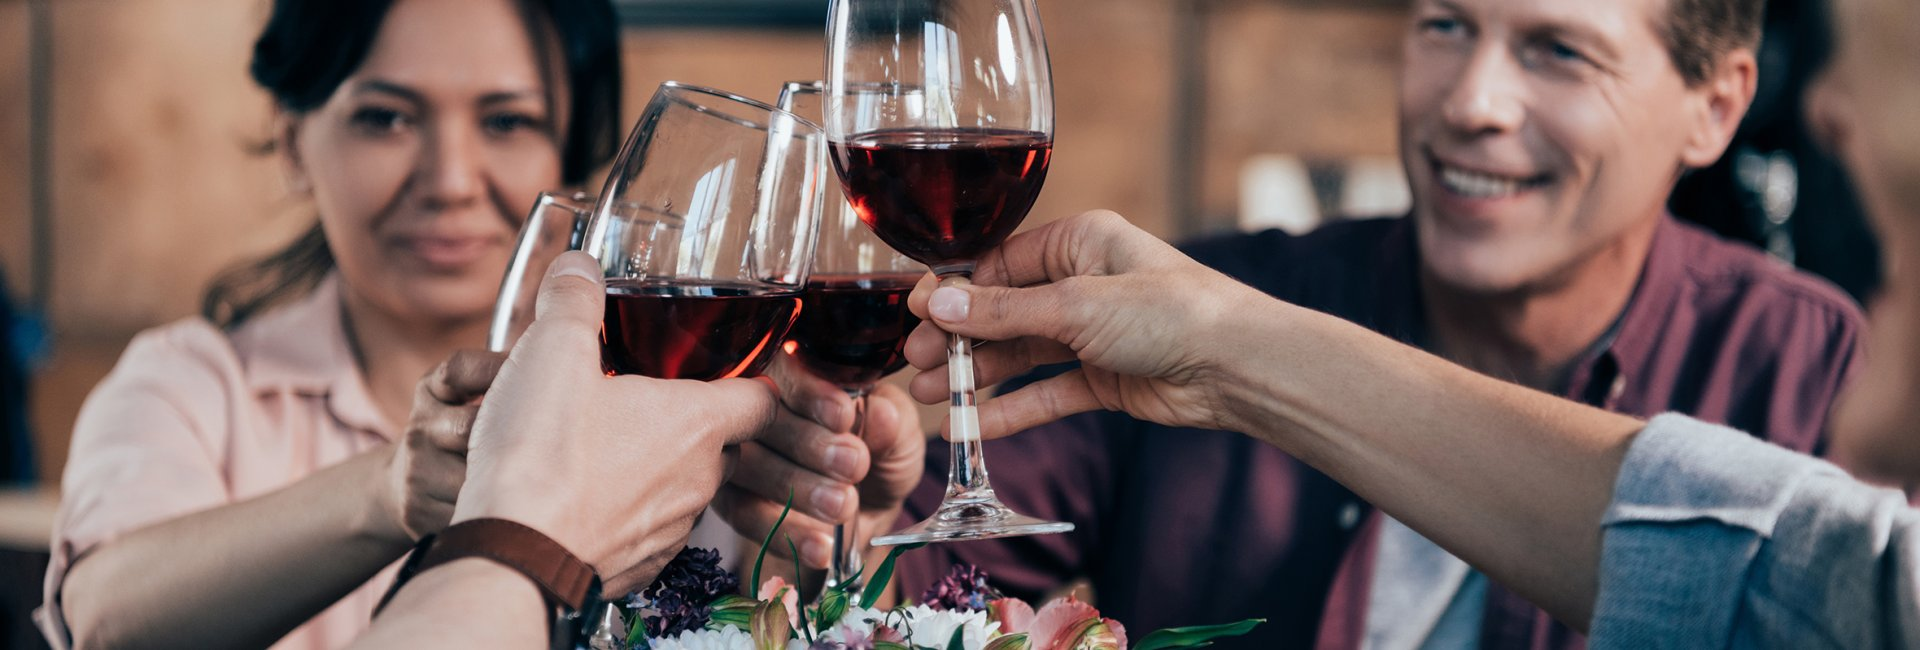 Jesienny weekend z winem